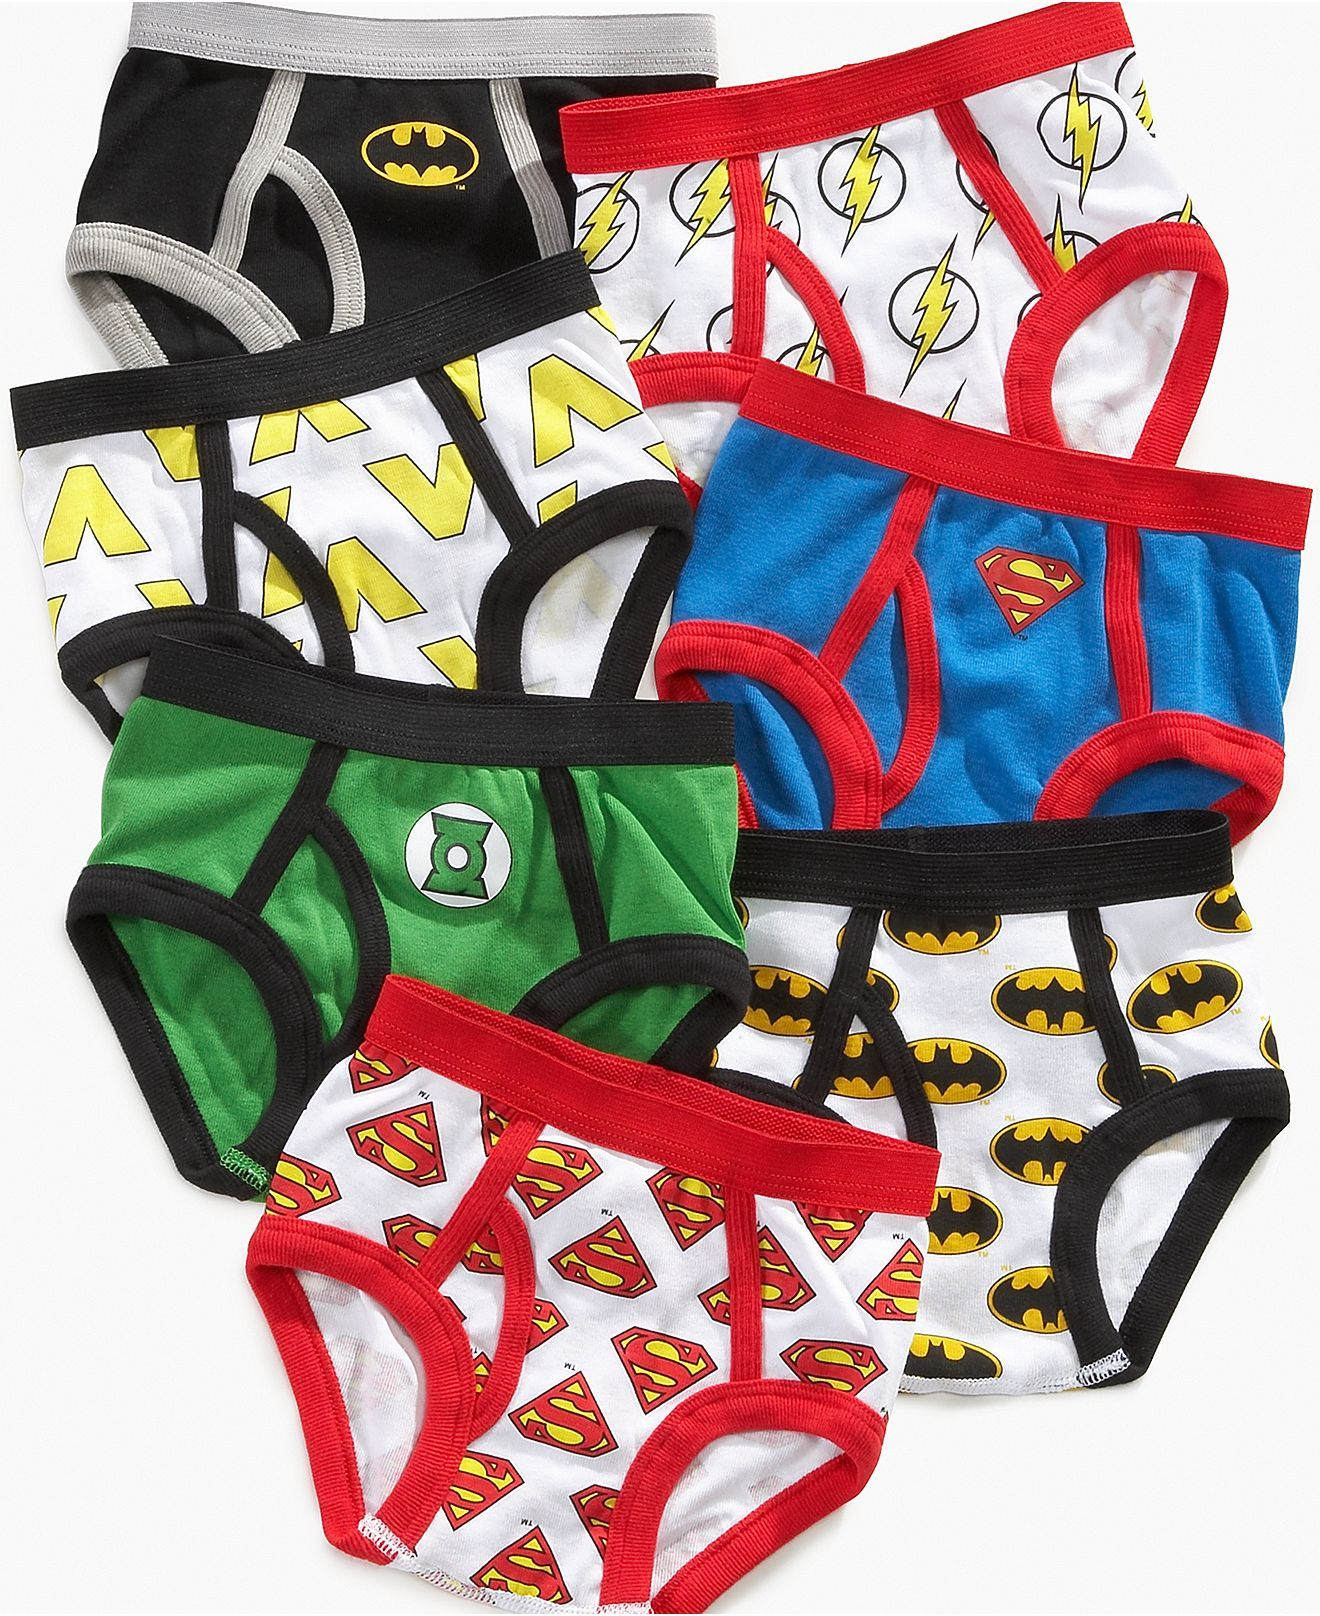 957ec1554d Justice League Kids Underwear, Toddler Boys 7 Pack Briefs - Kids - Macy's